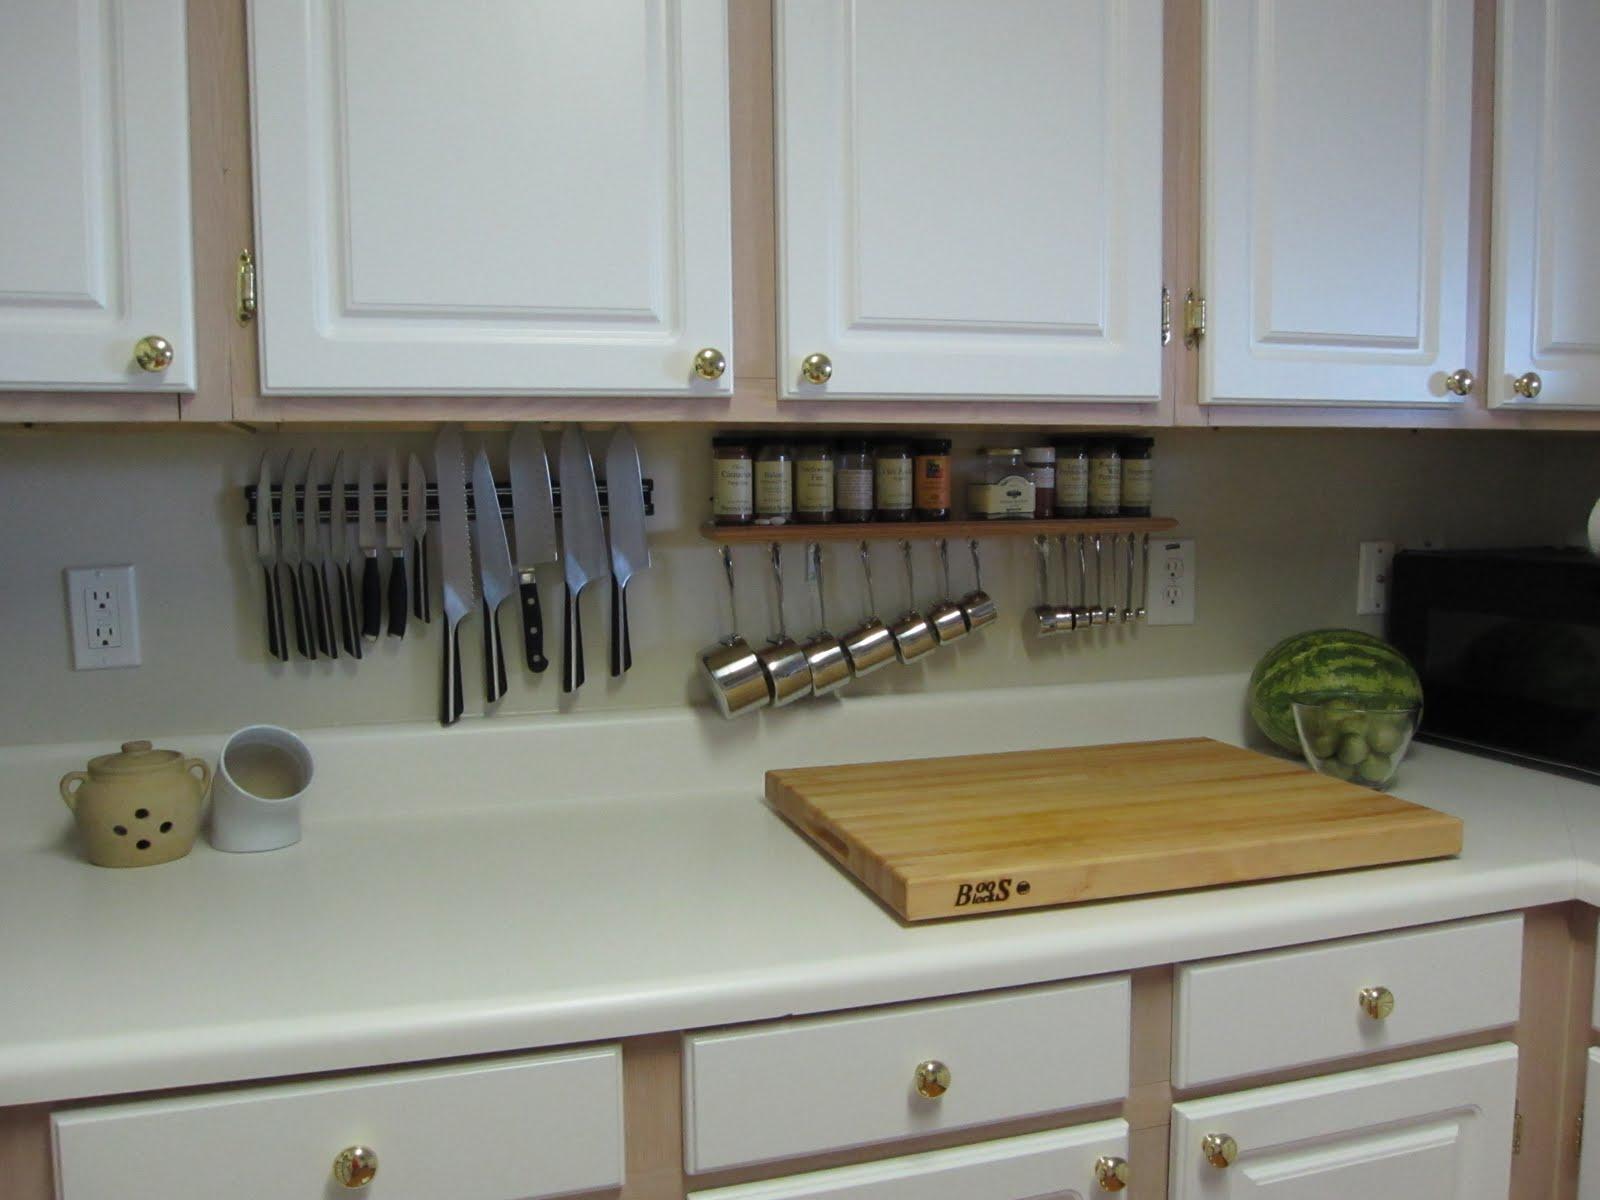 The Saucy Kitchen: Storage Solutions